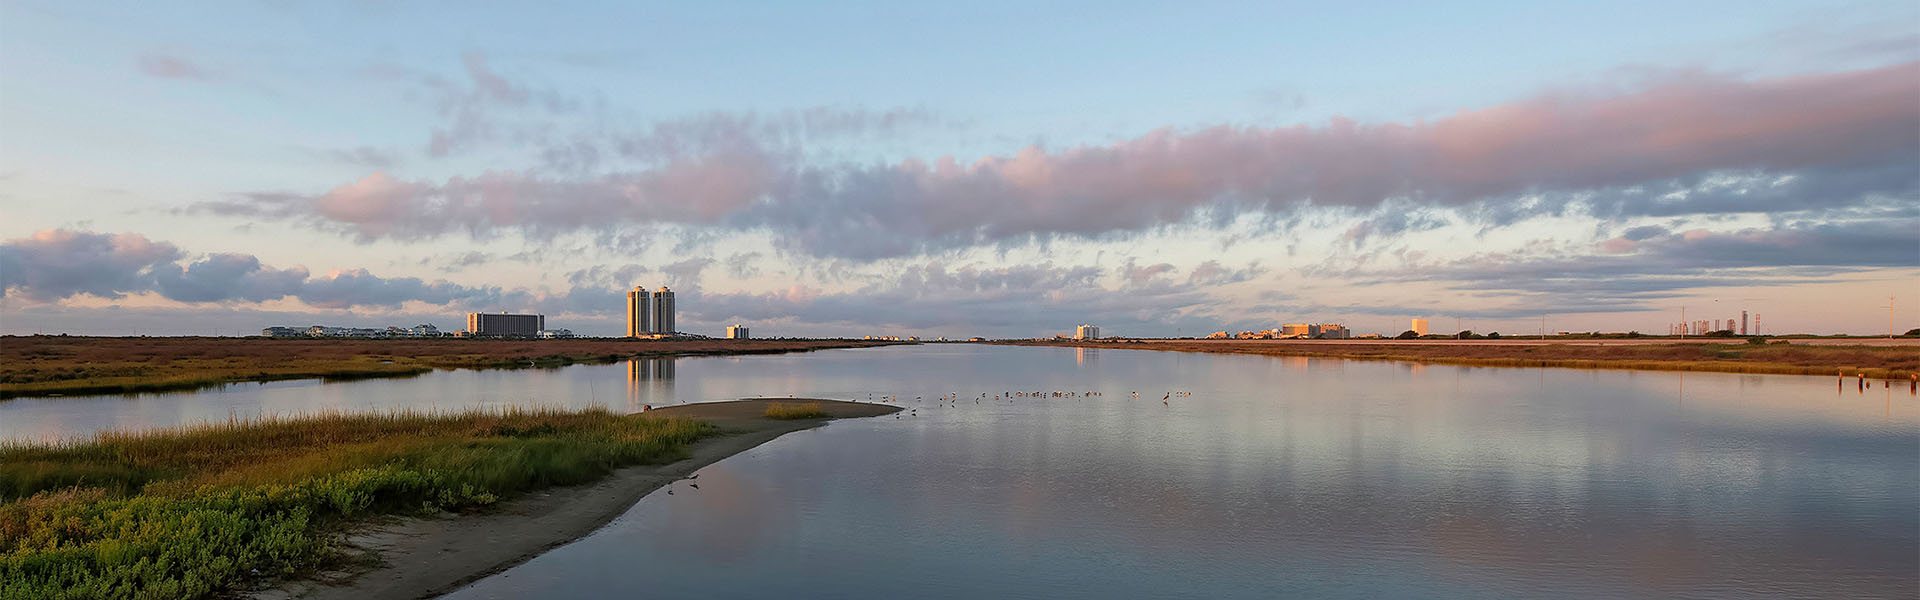 East End Lagoon